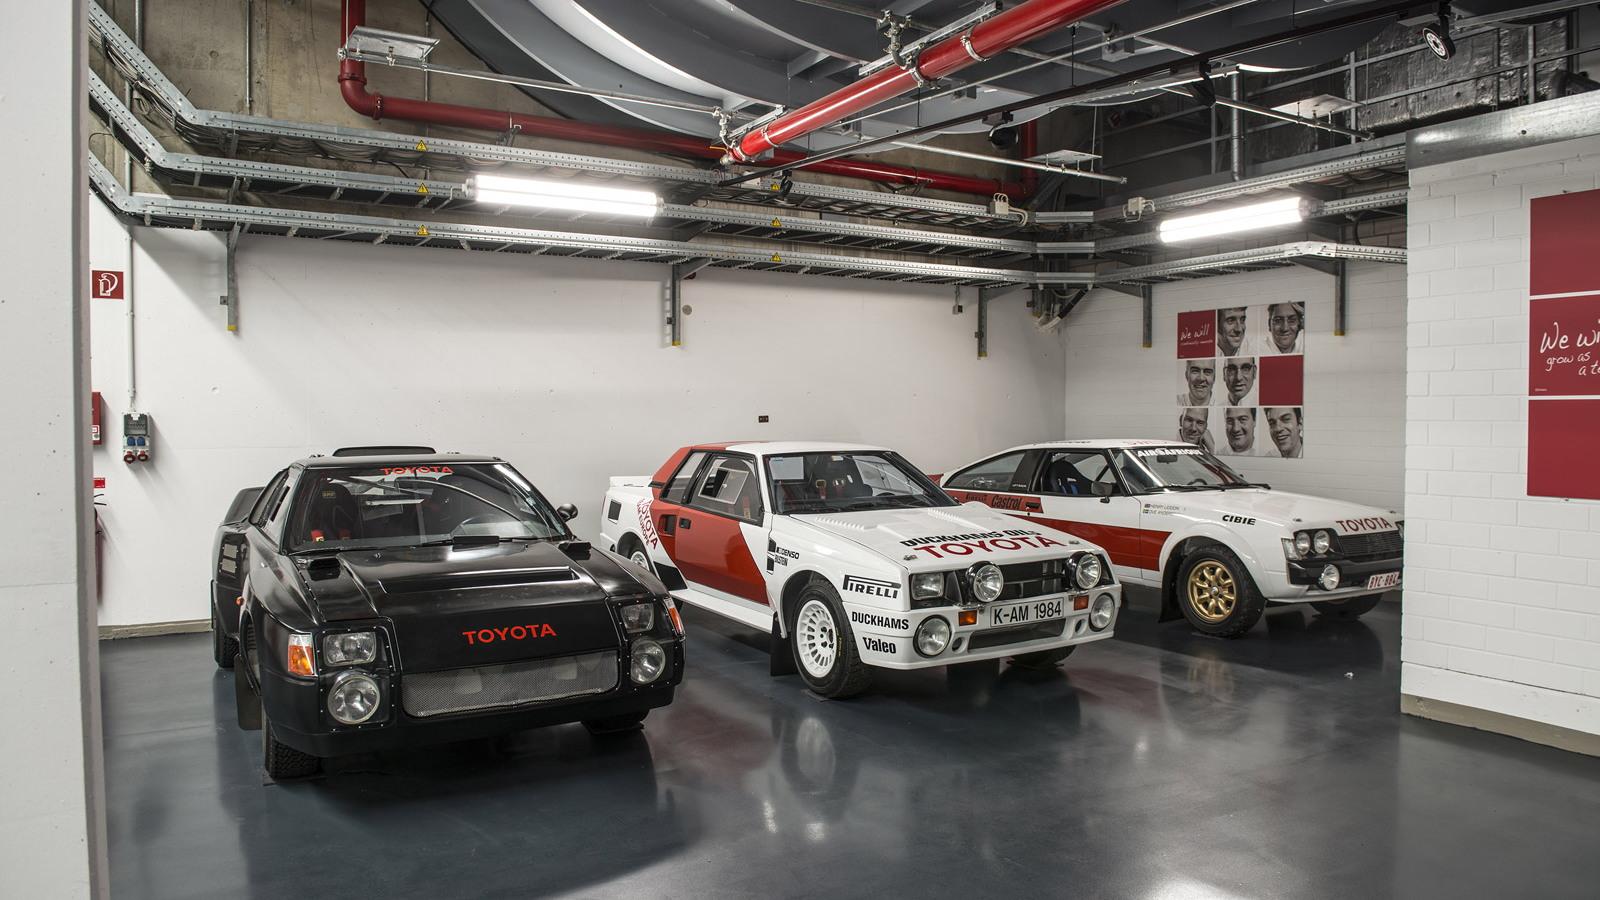 Toyota Rally Heritage: 1985 Group S concept, 1983 Celica TA64, 1979 Celica RA40